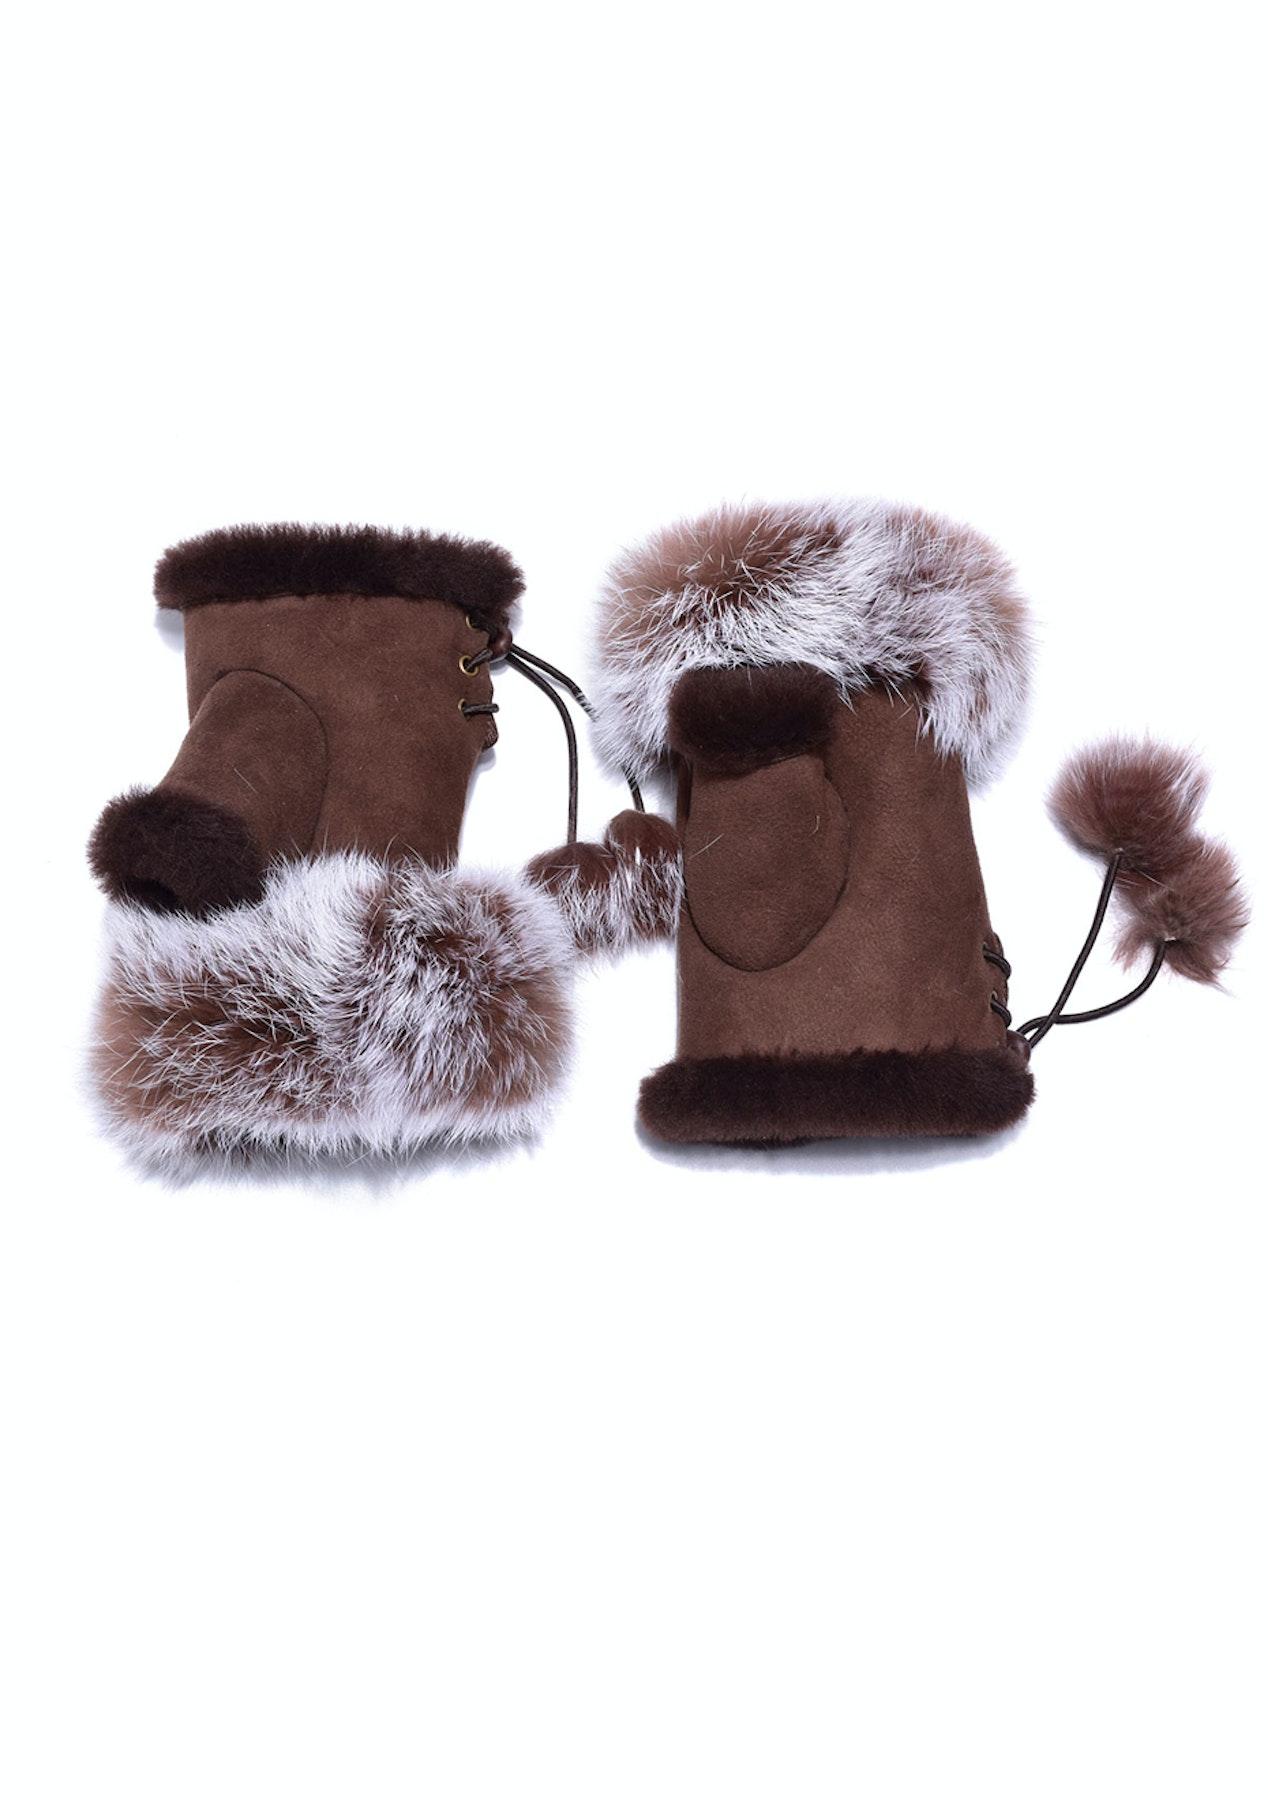 13f15cdc594 Auzland Ugg Australian Fingerless Sheepskin Leather Gloves Chocolate Womens  (Cindy)